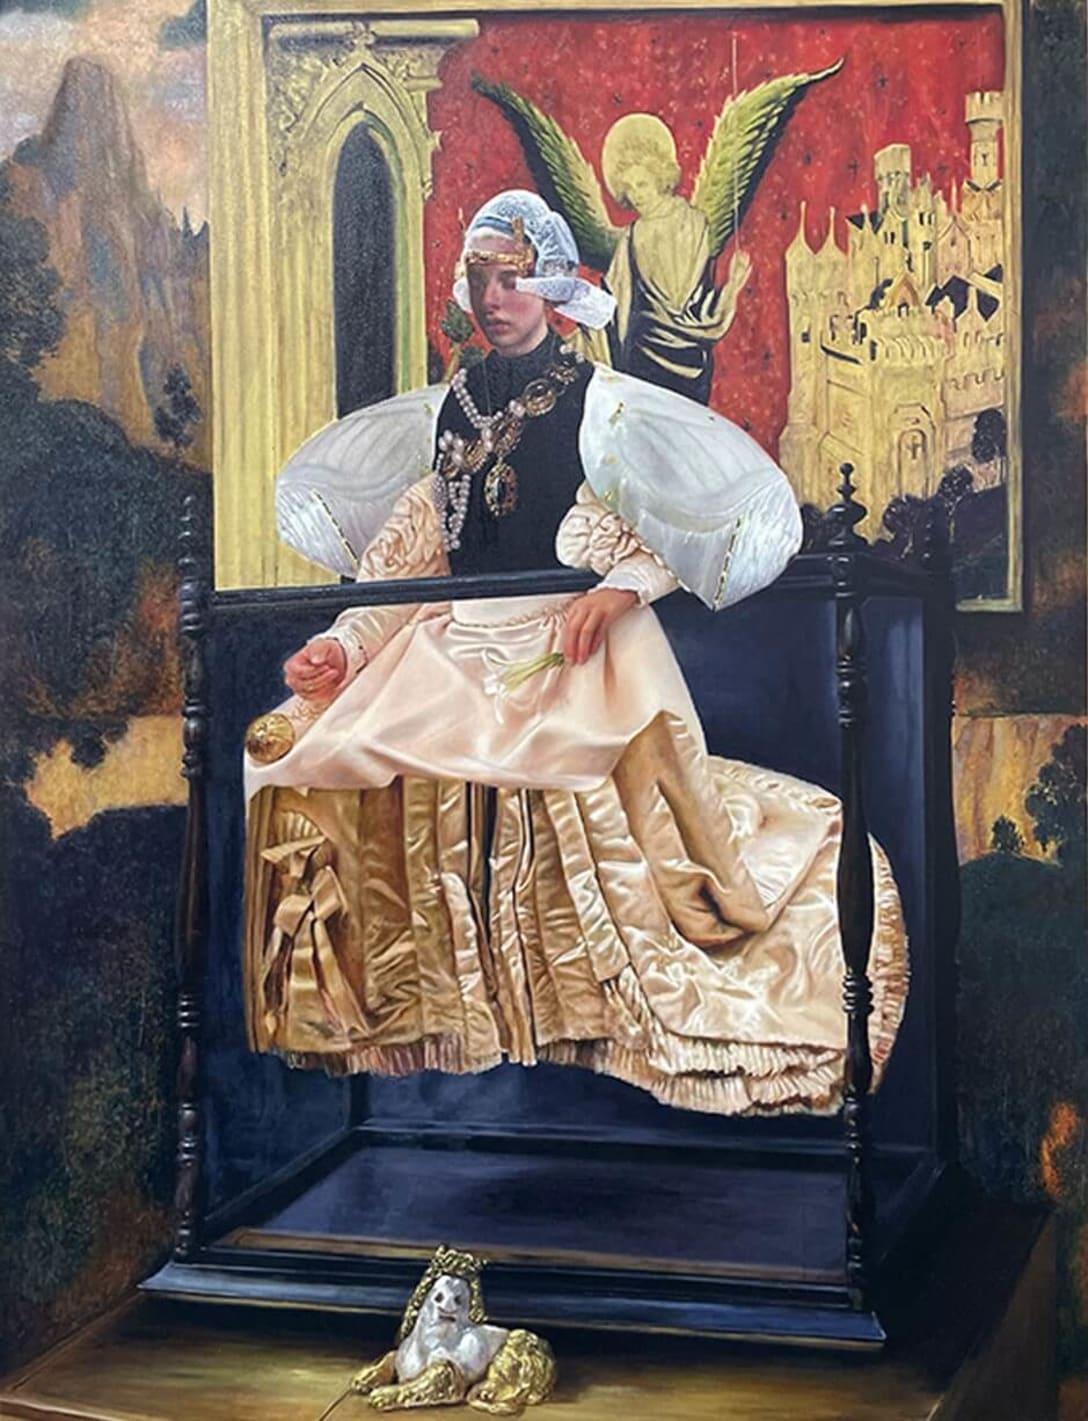 Inside is Light, 2021, Oil on canvas, 148 x 112 cm ©Teodora Axente